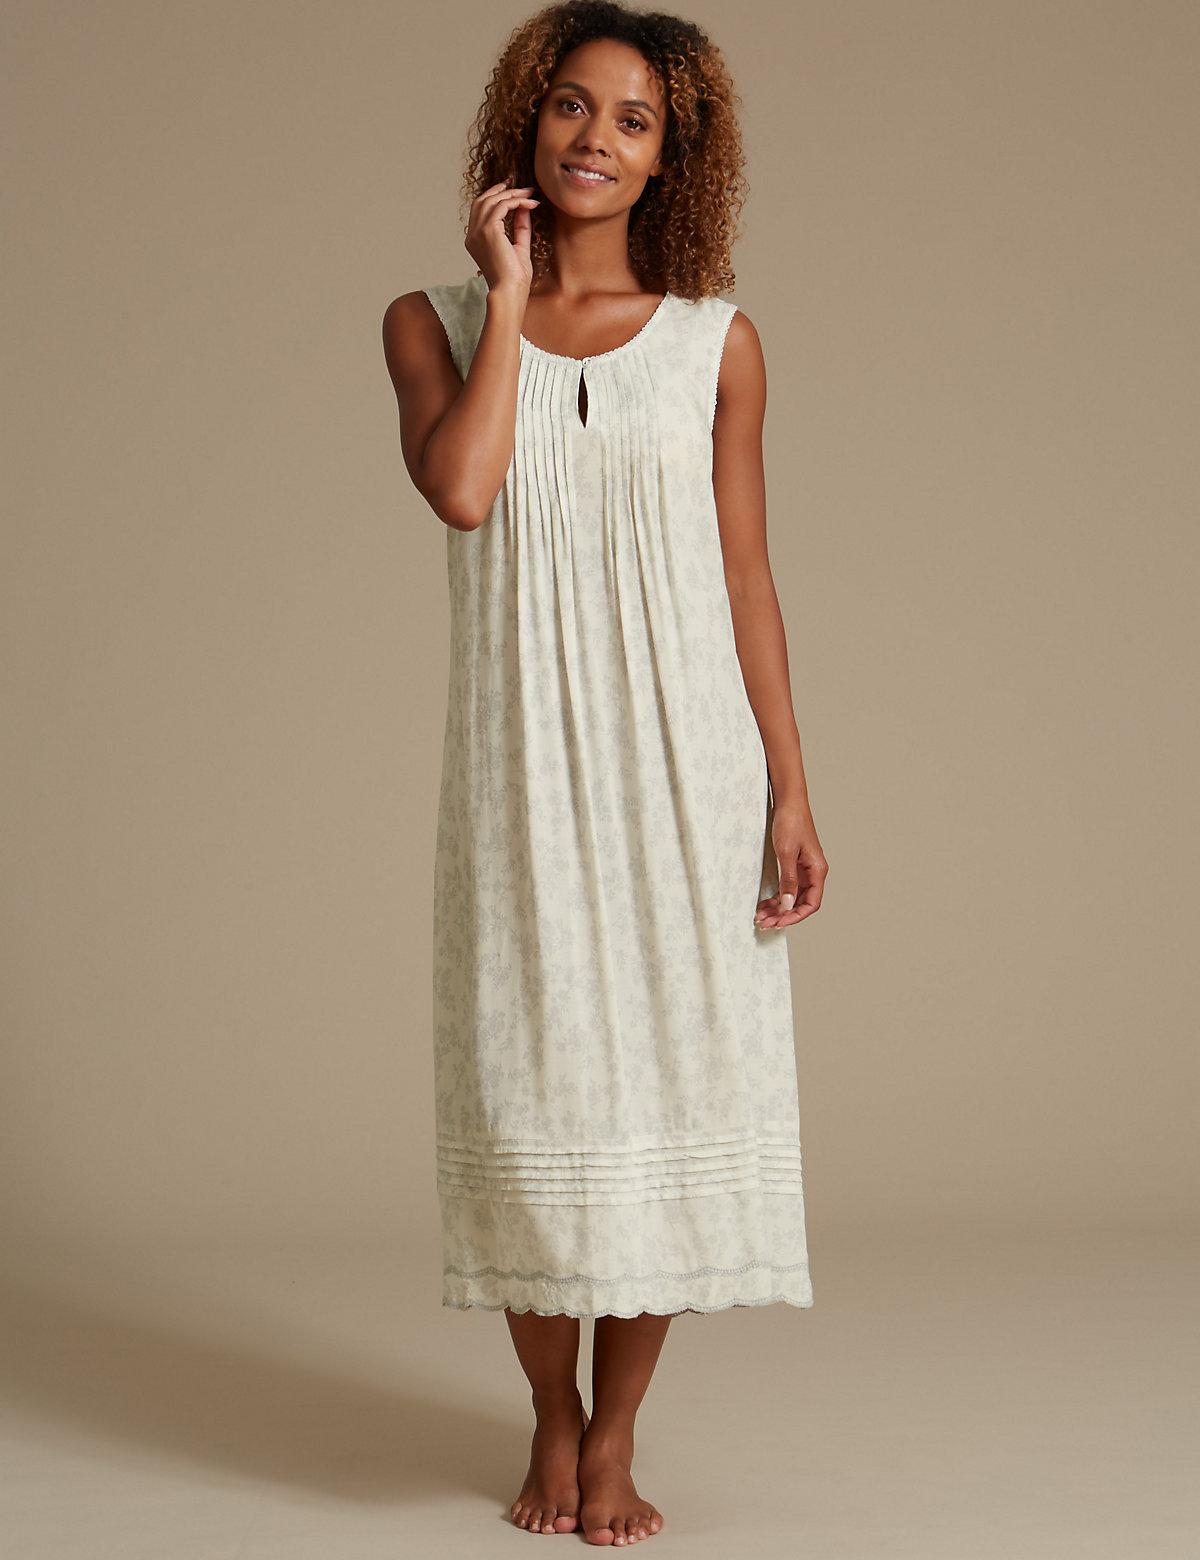 M&s Collection Rayon Print Long Nightdress